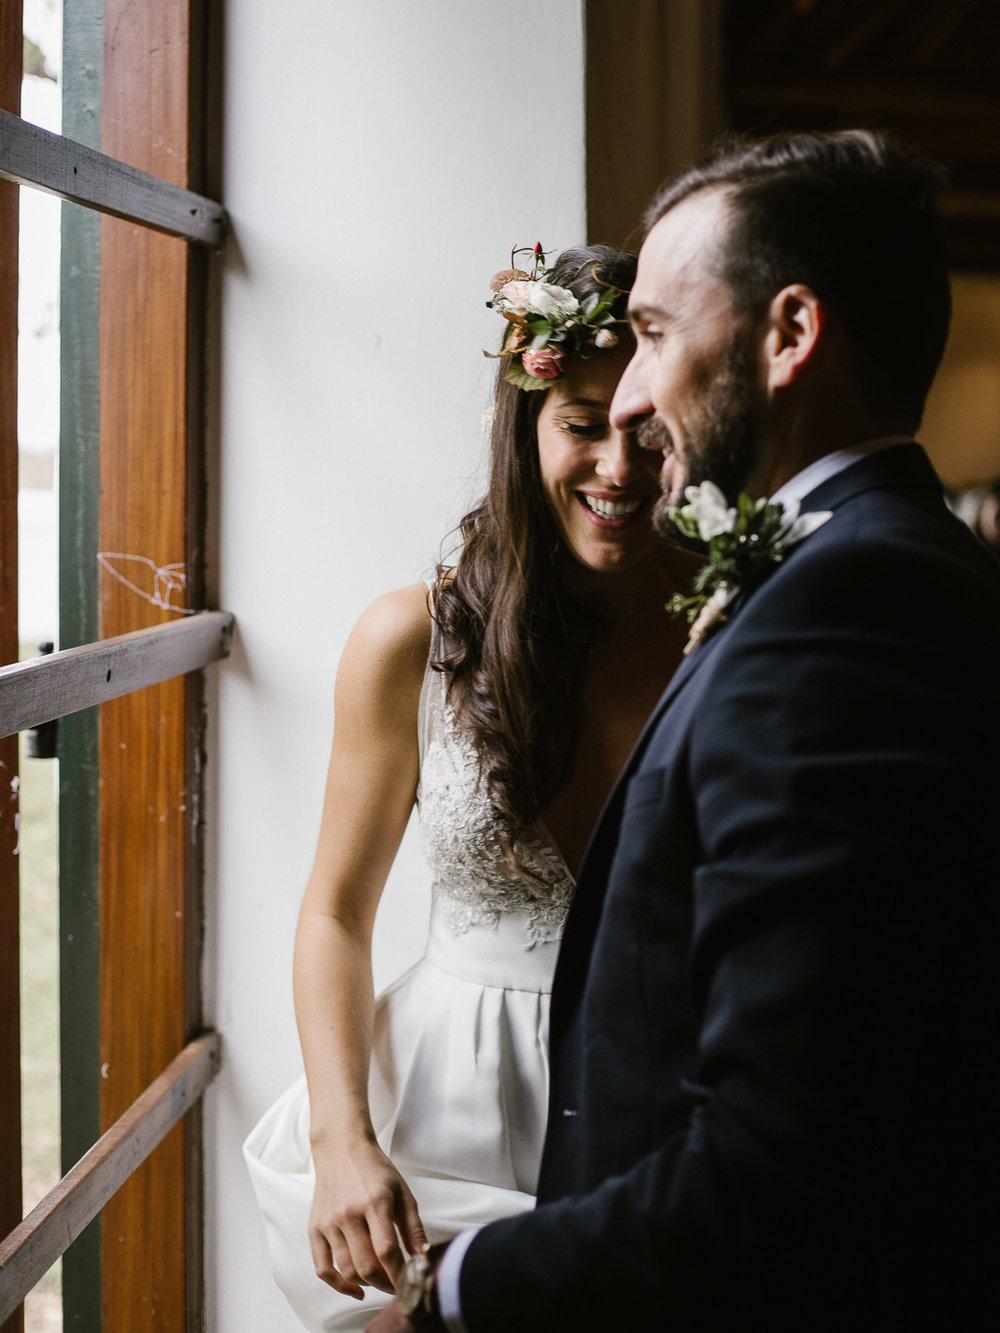 cape-town-wedding-photographer-sean-shannon-photography-26.jpg